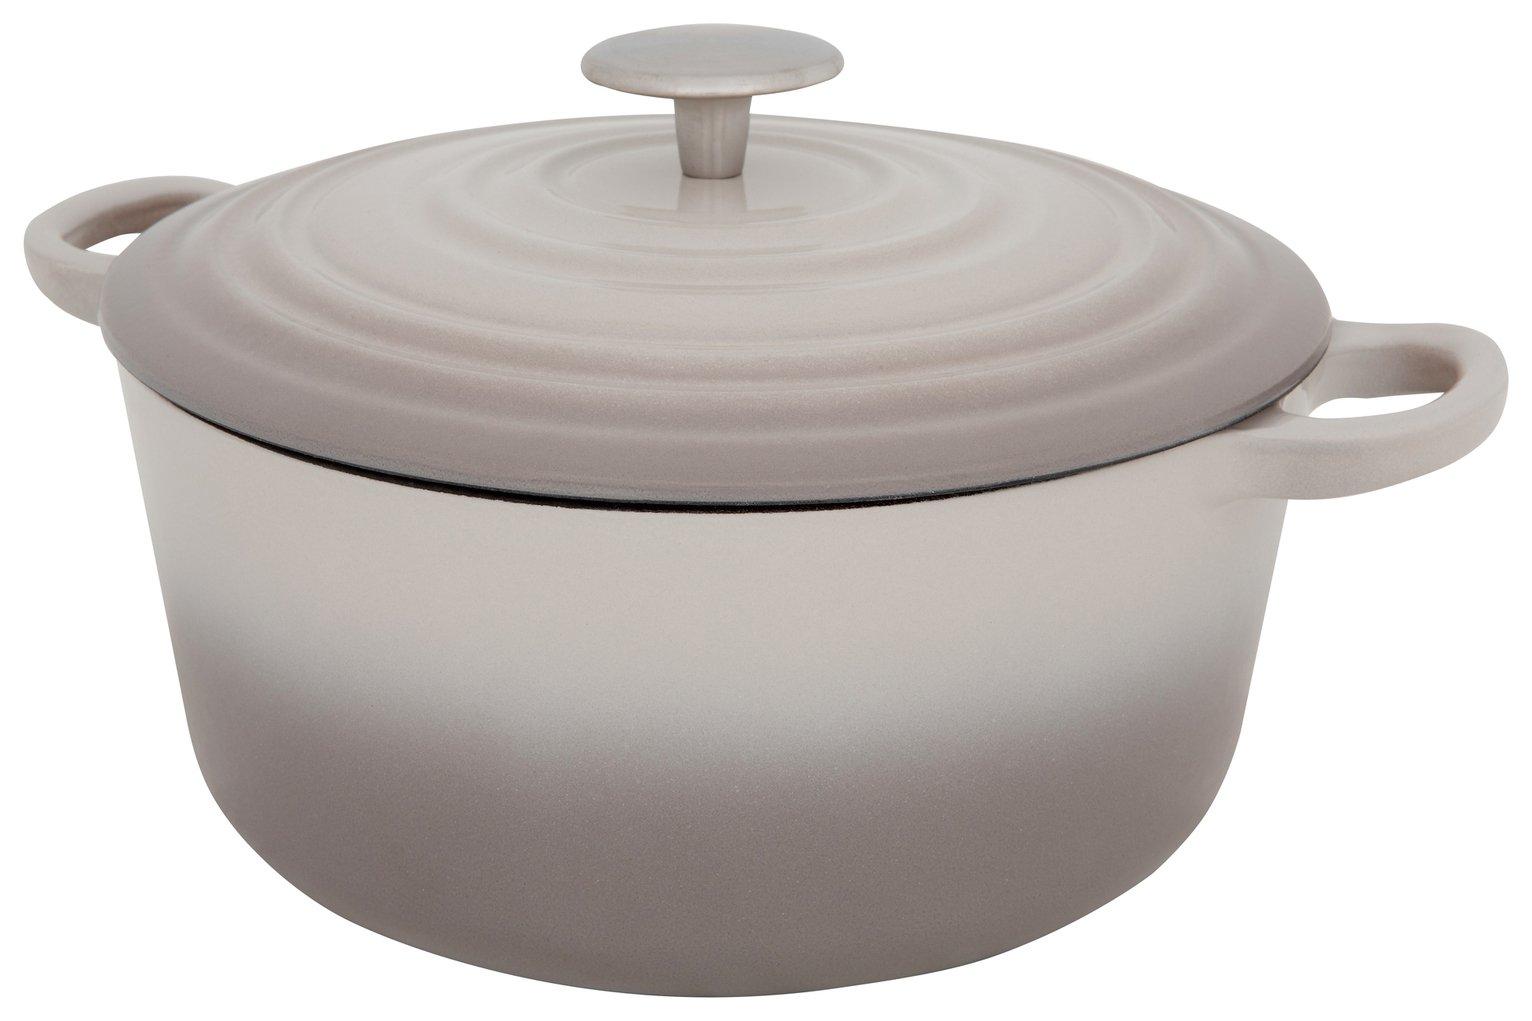 Sainsbury's Home 3.3 Litre Cast Iron Casserole Dish